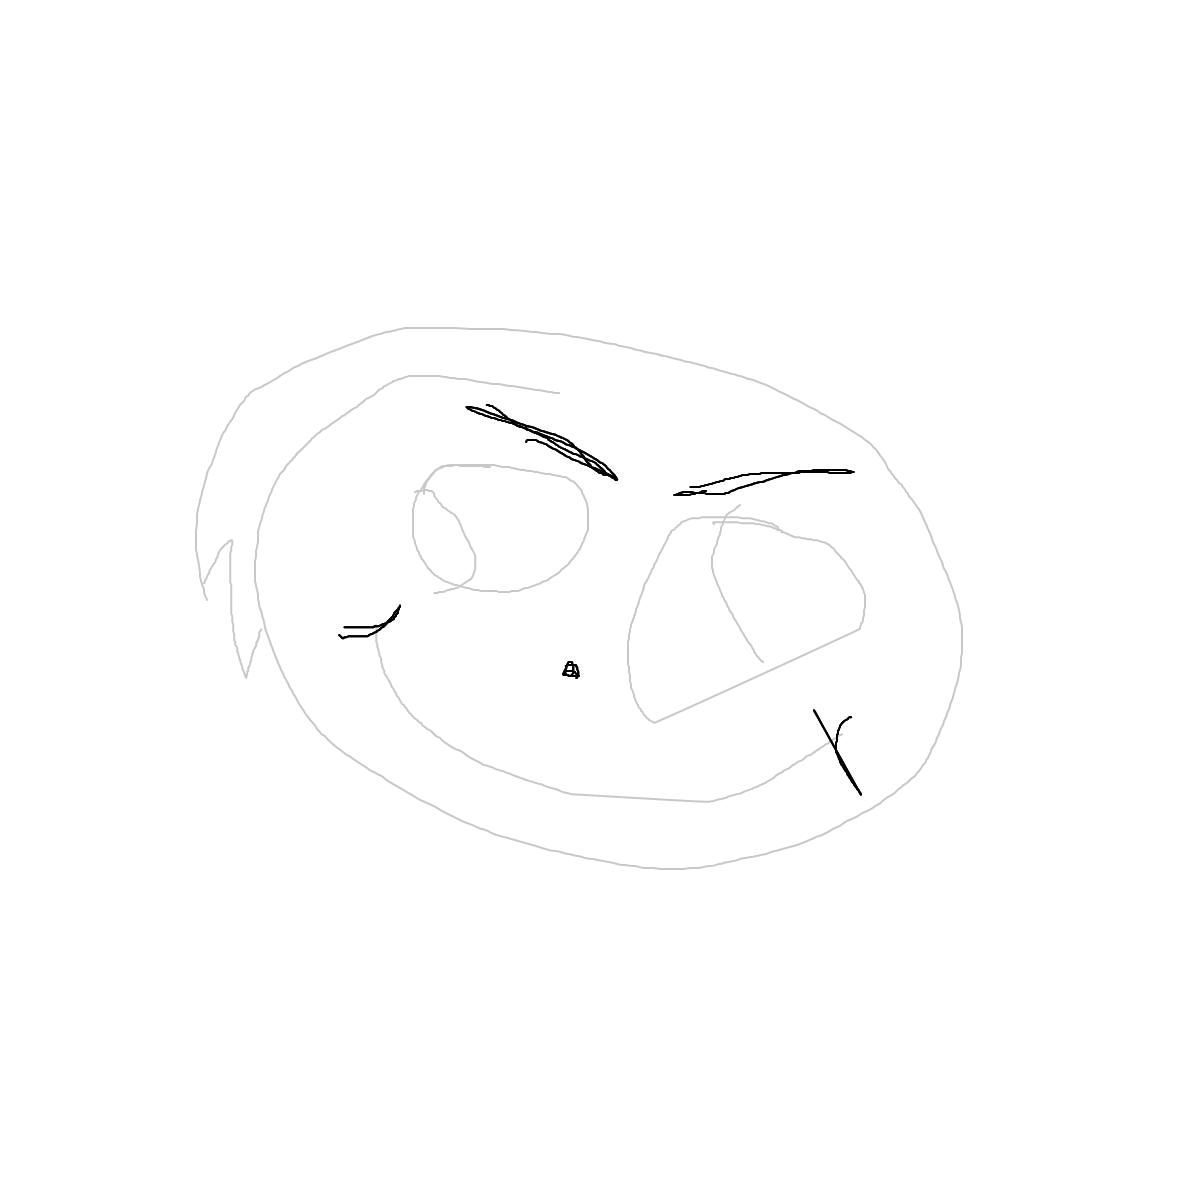 BAAAM drawing#2669 lat:63.5731658935546900lng: 37.9268074035644500